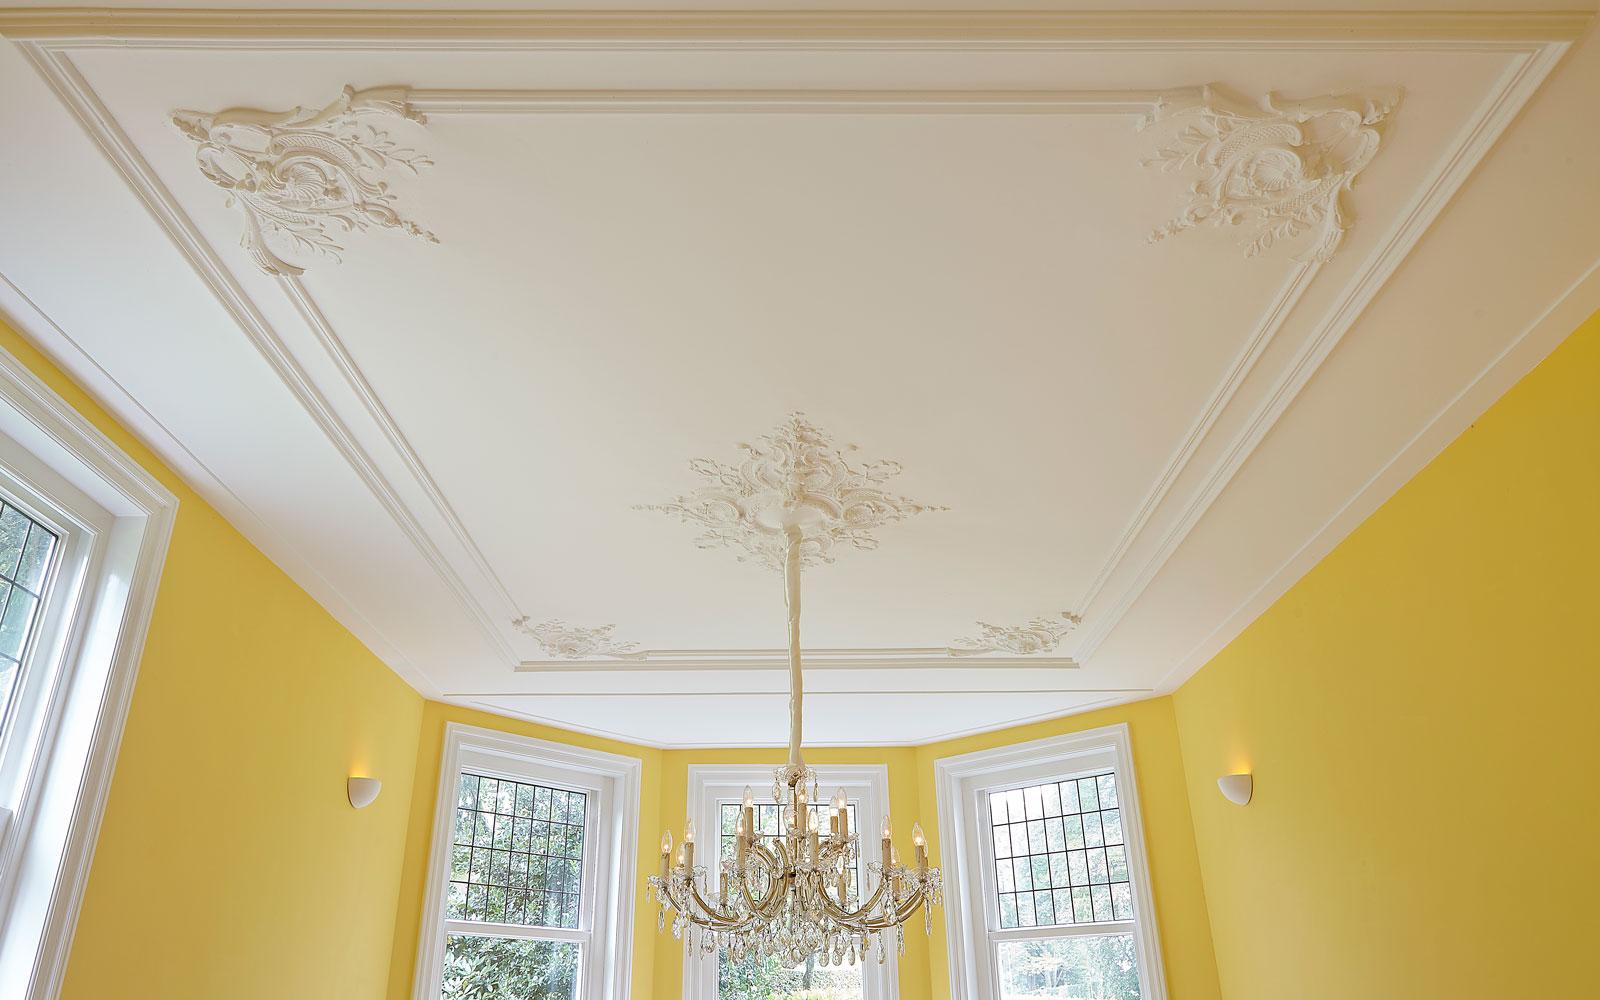 The Art of Living, Exclusief wonen, Plafond Underlayment platen Monumentale ornamenten Kroonluchter, geel, wit, kunst, schilderwerk, stucwerk, ramen, plafond